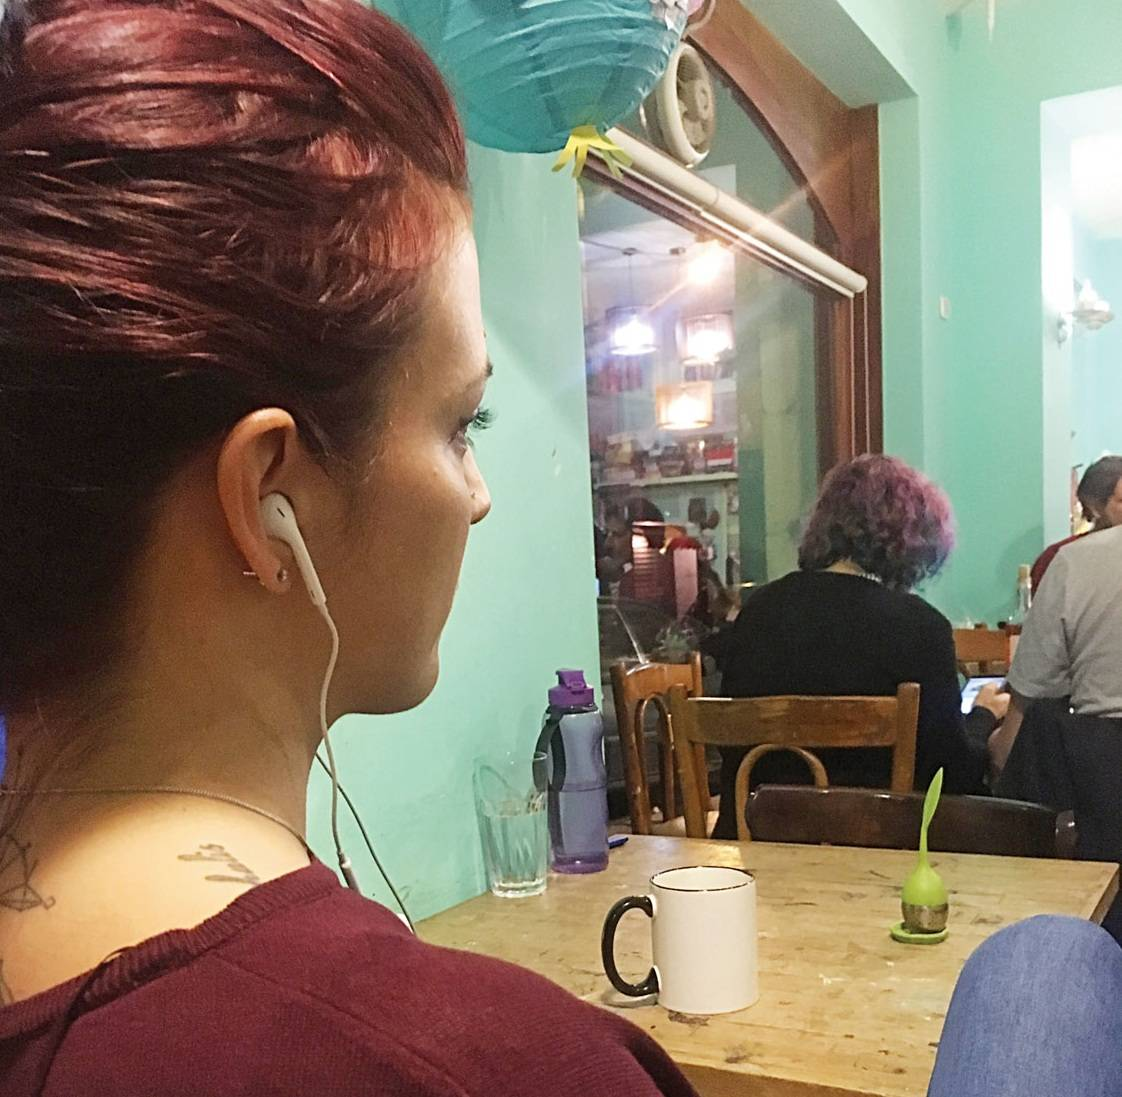 L'industrie du podcast arabe en chantier